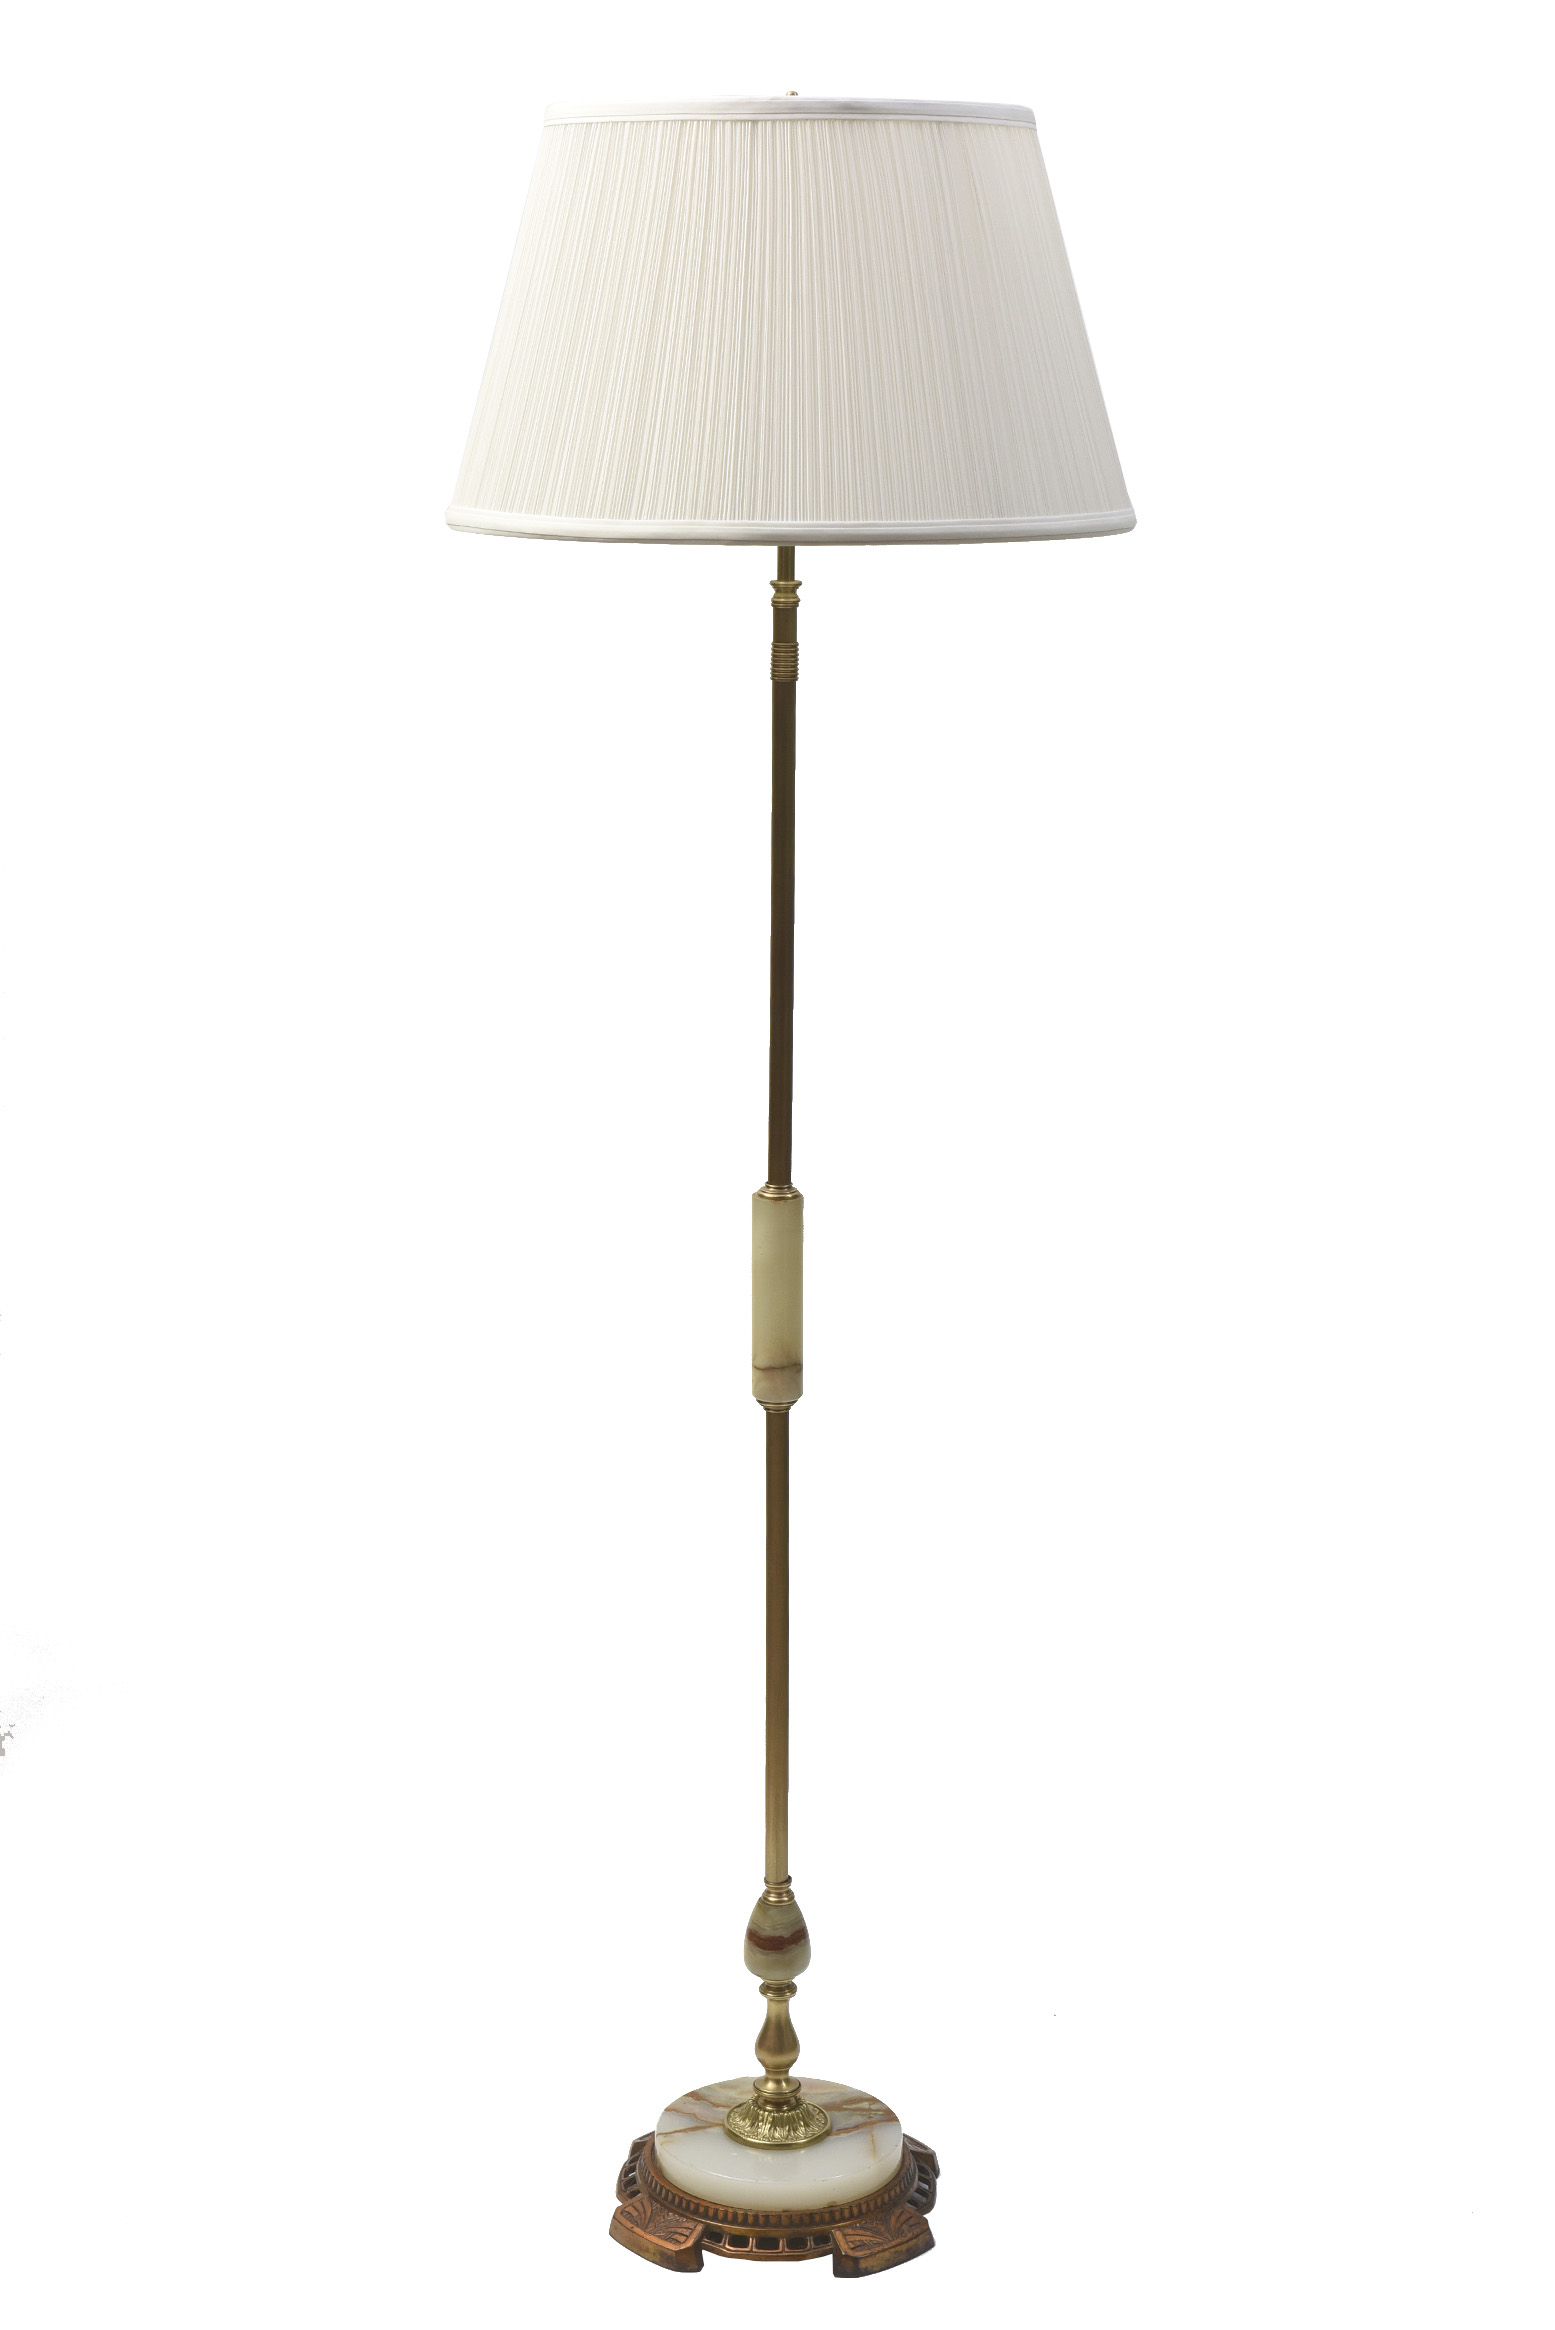 Floor Lamp With Onyx Stem And Base Appleton Antique Lighting